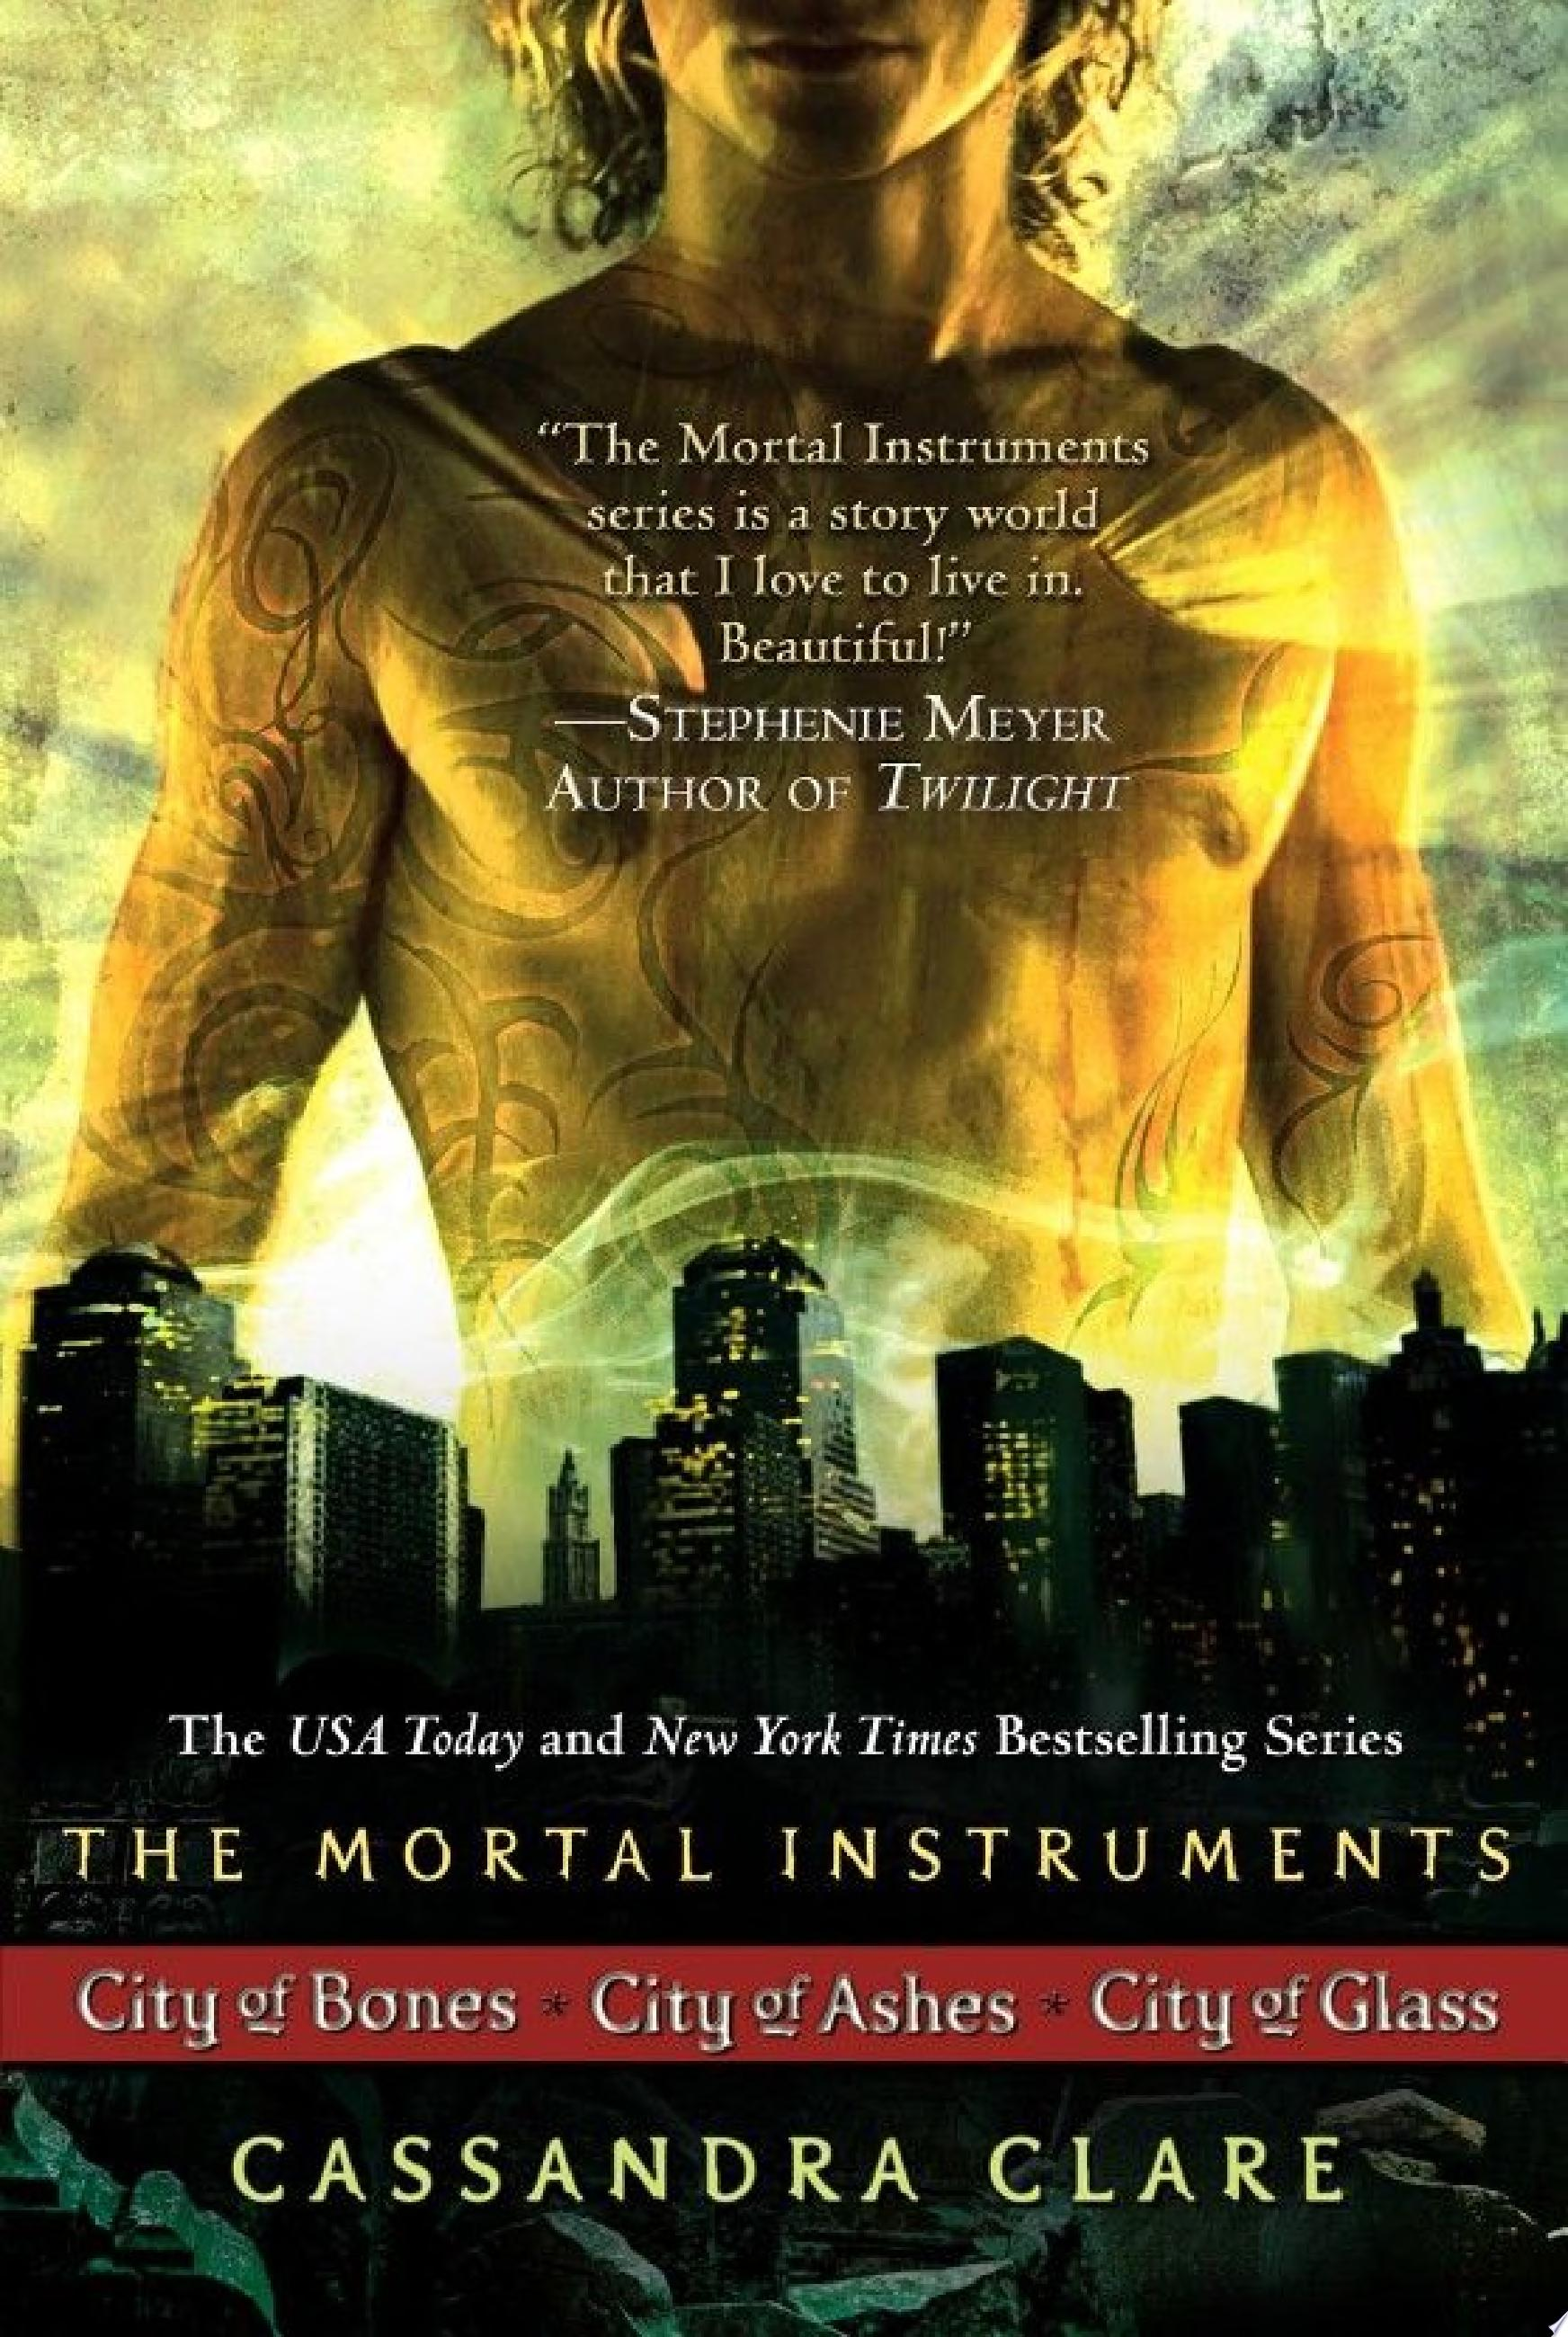 Cassandra Clare  The Mortal Instrument Series  3 books